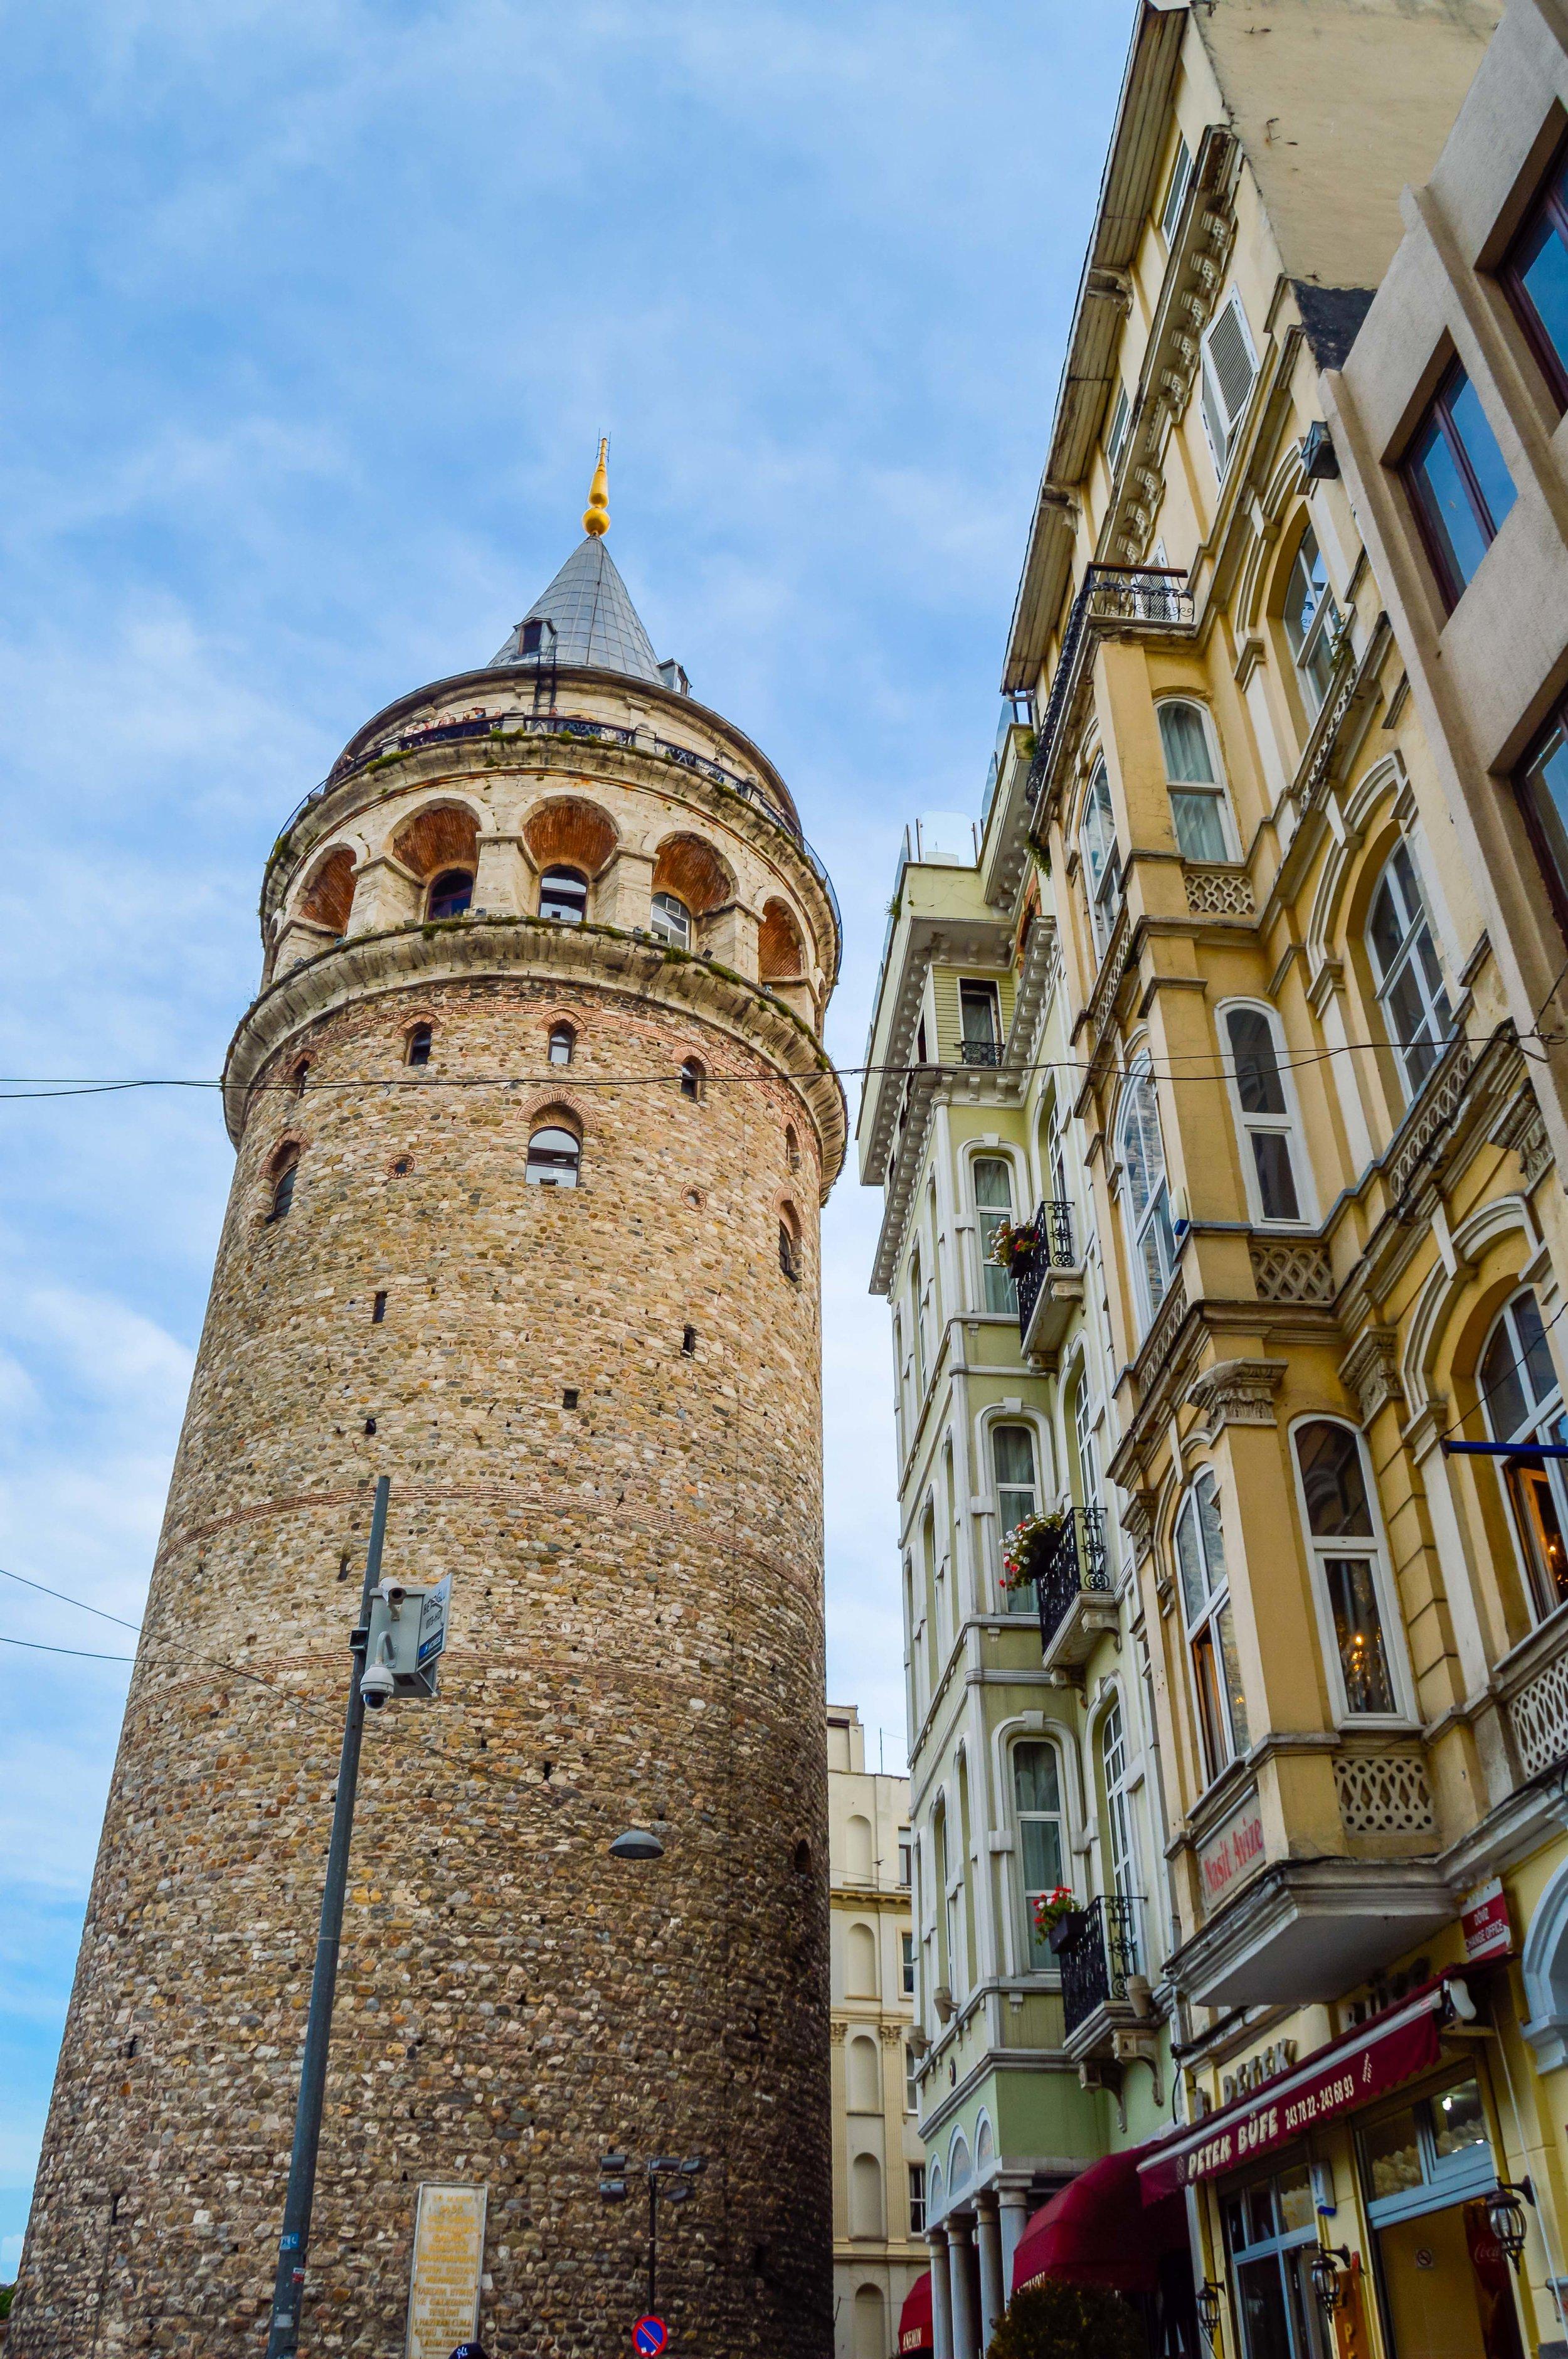 Galata Tower Rowhomes Skyline Blue Sky Muslim Ottoman Empire Medieval Architecture Istanbul Turkey